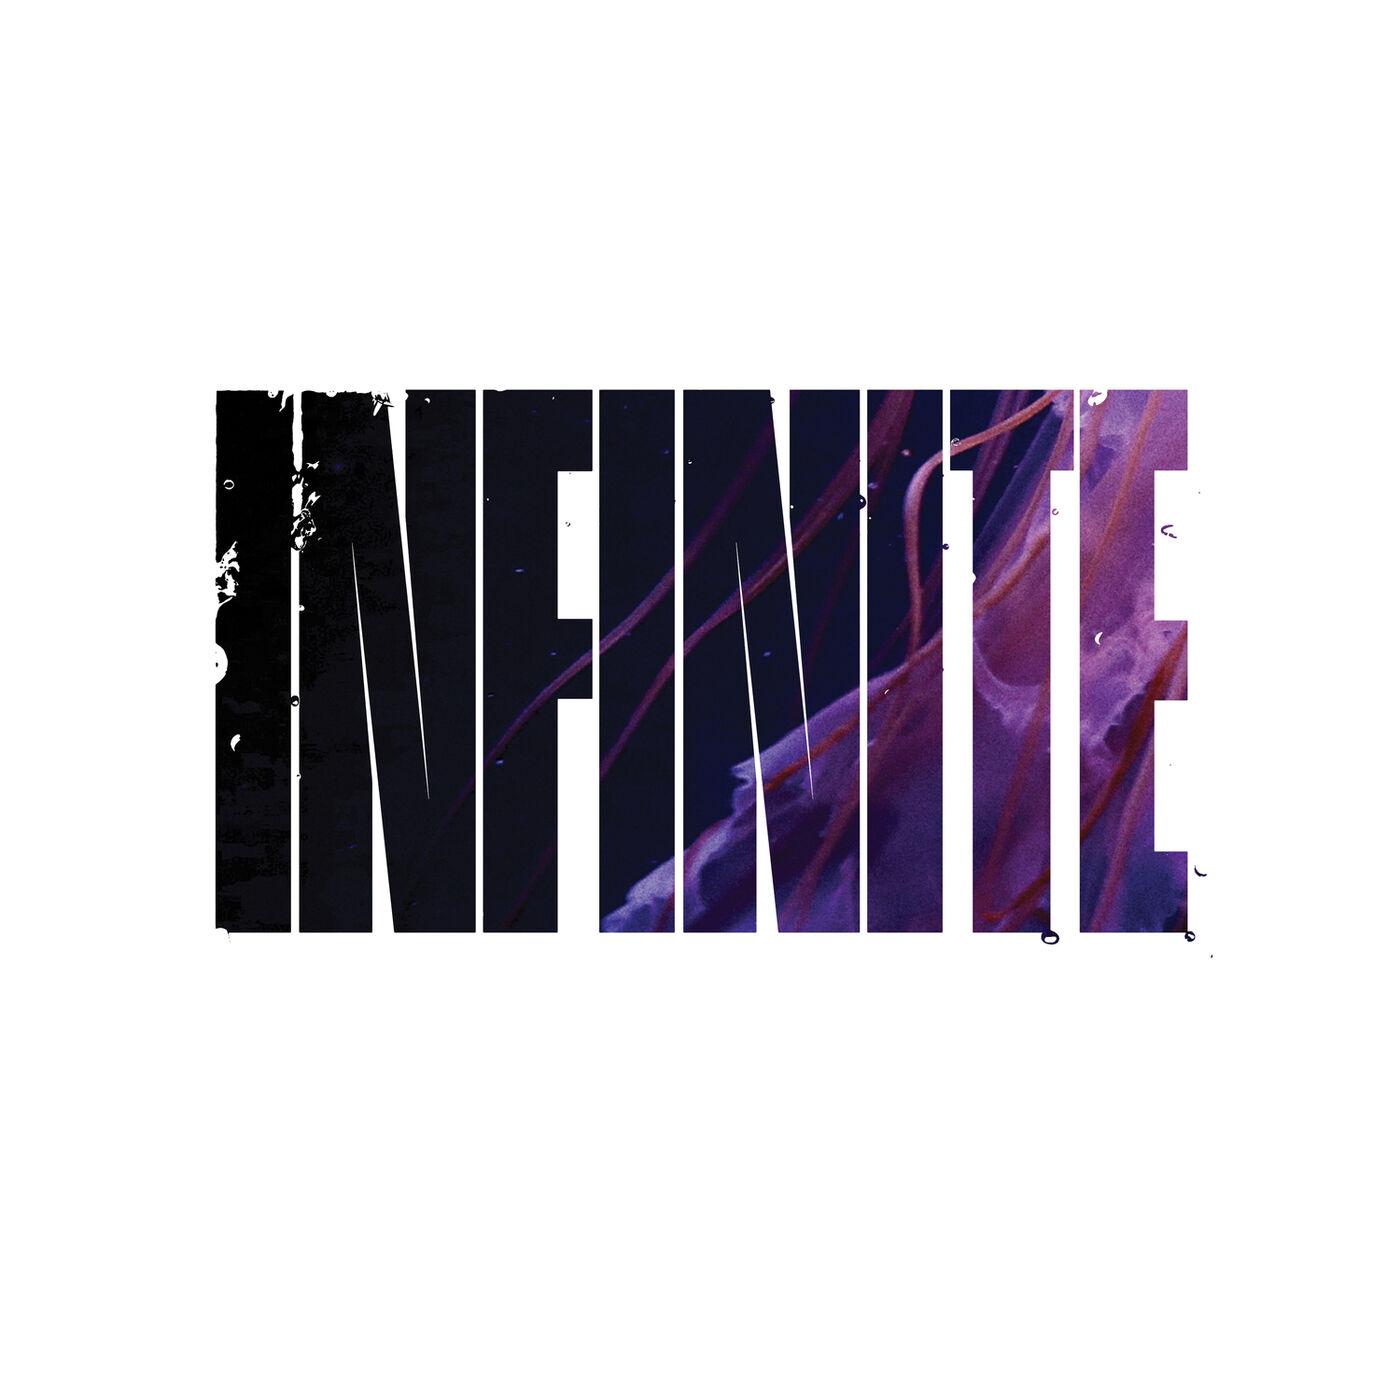 Silverstein - Infinite [single] (2020)